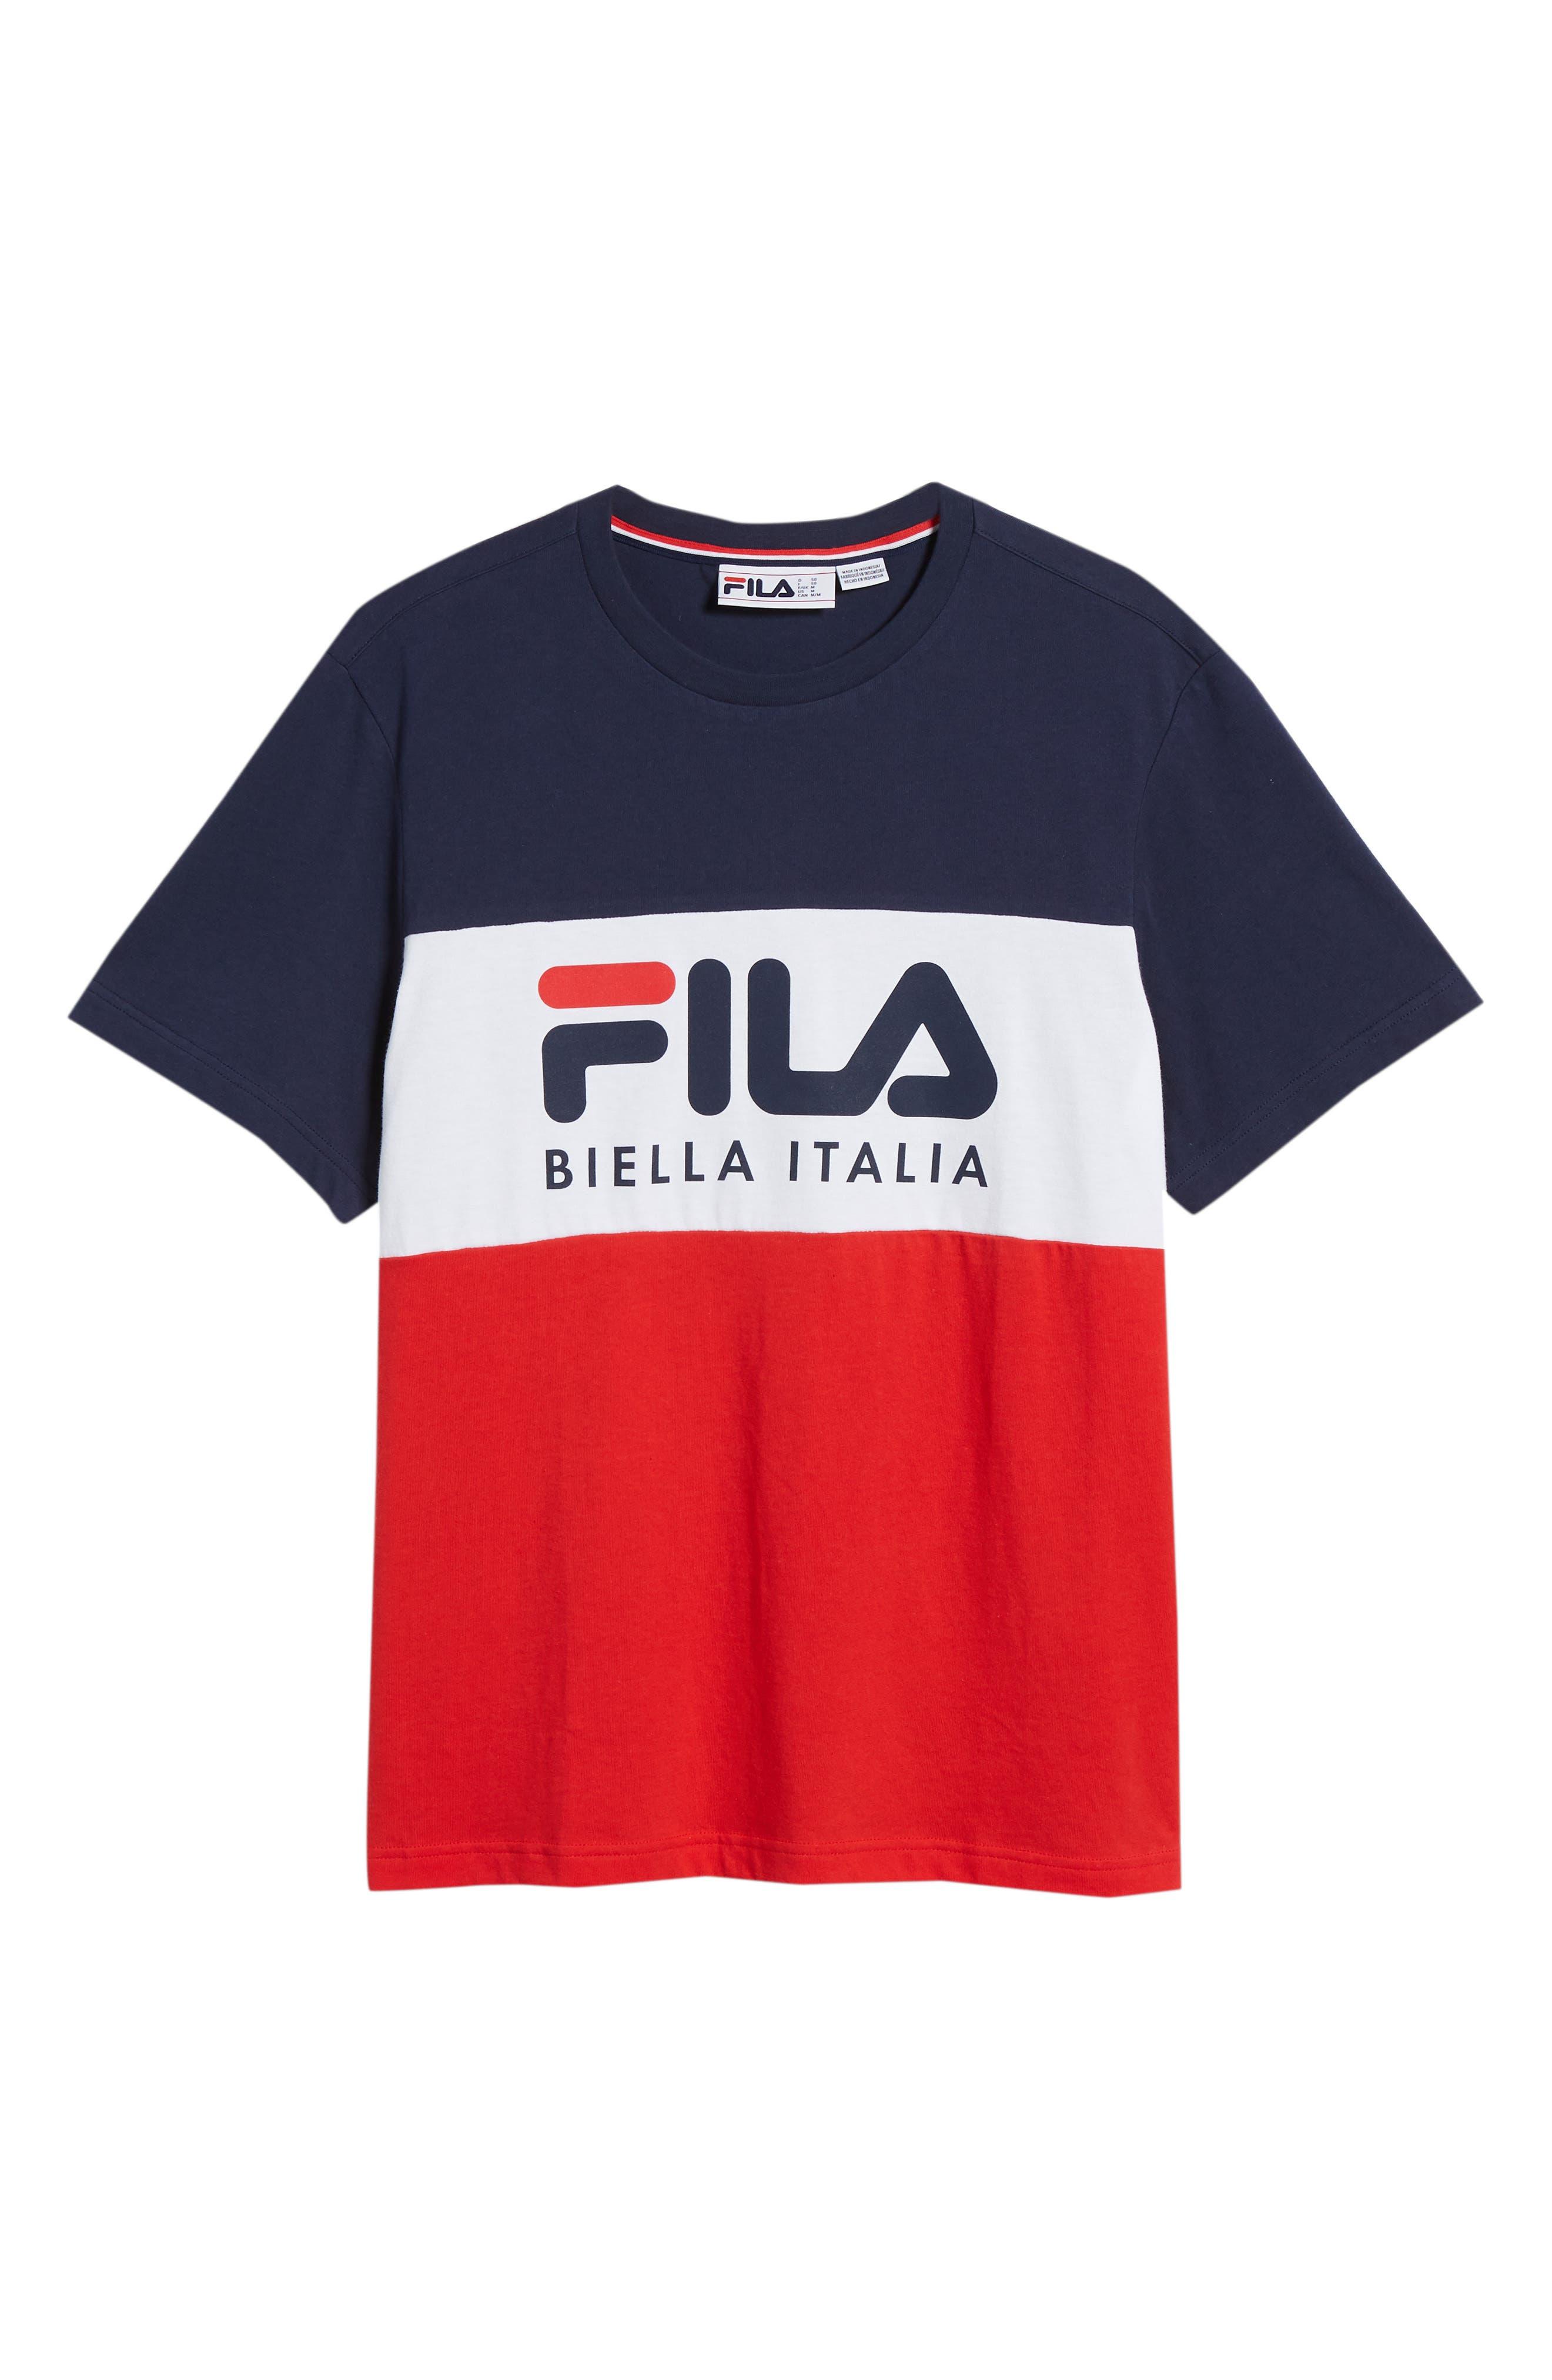 Biella Italia T-Shirt,                             Alternate thumbnail 6, color,                             Navy/ White/ Red